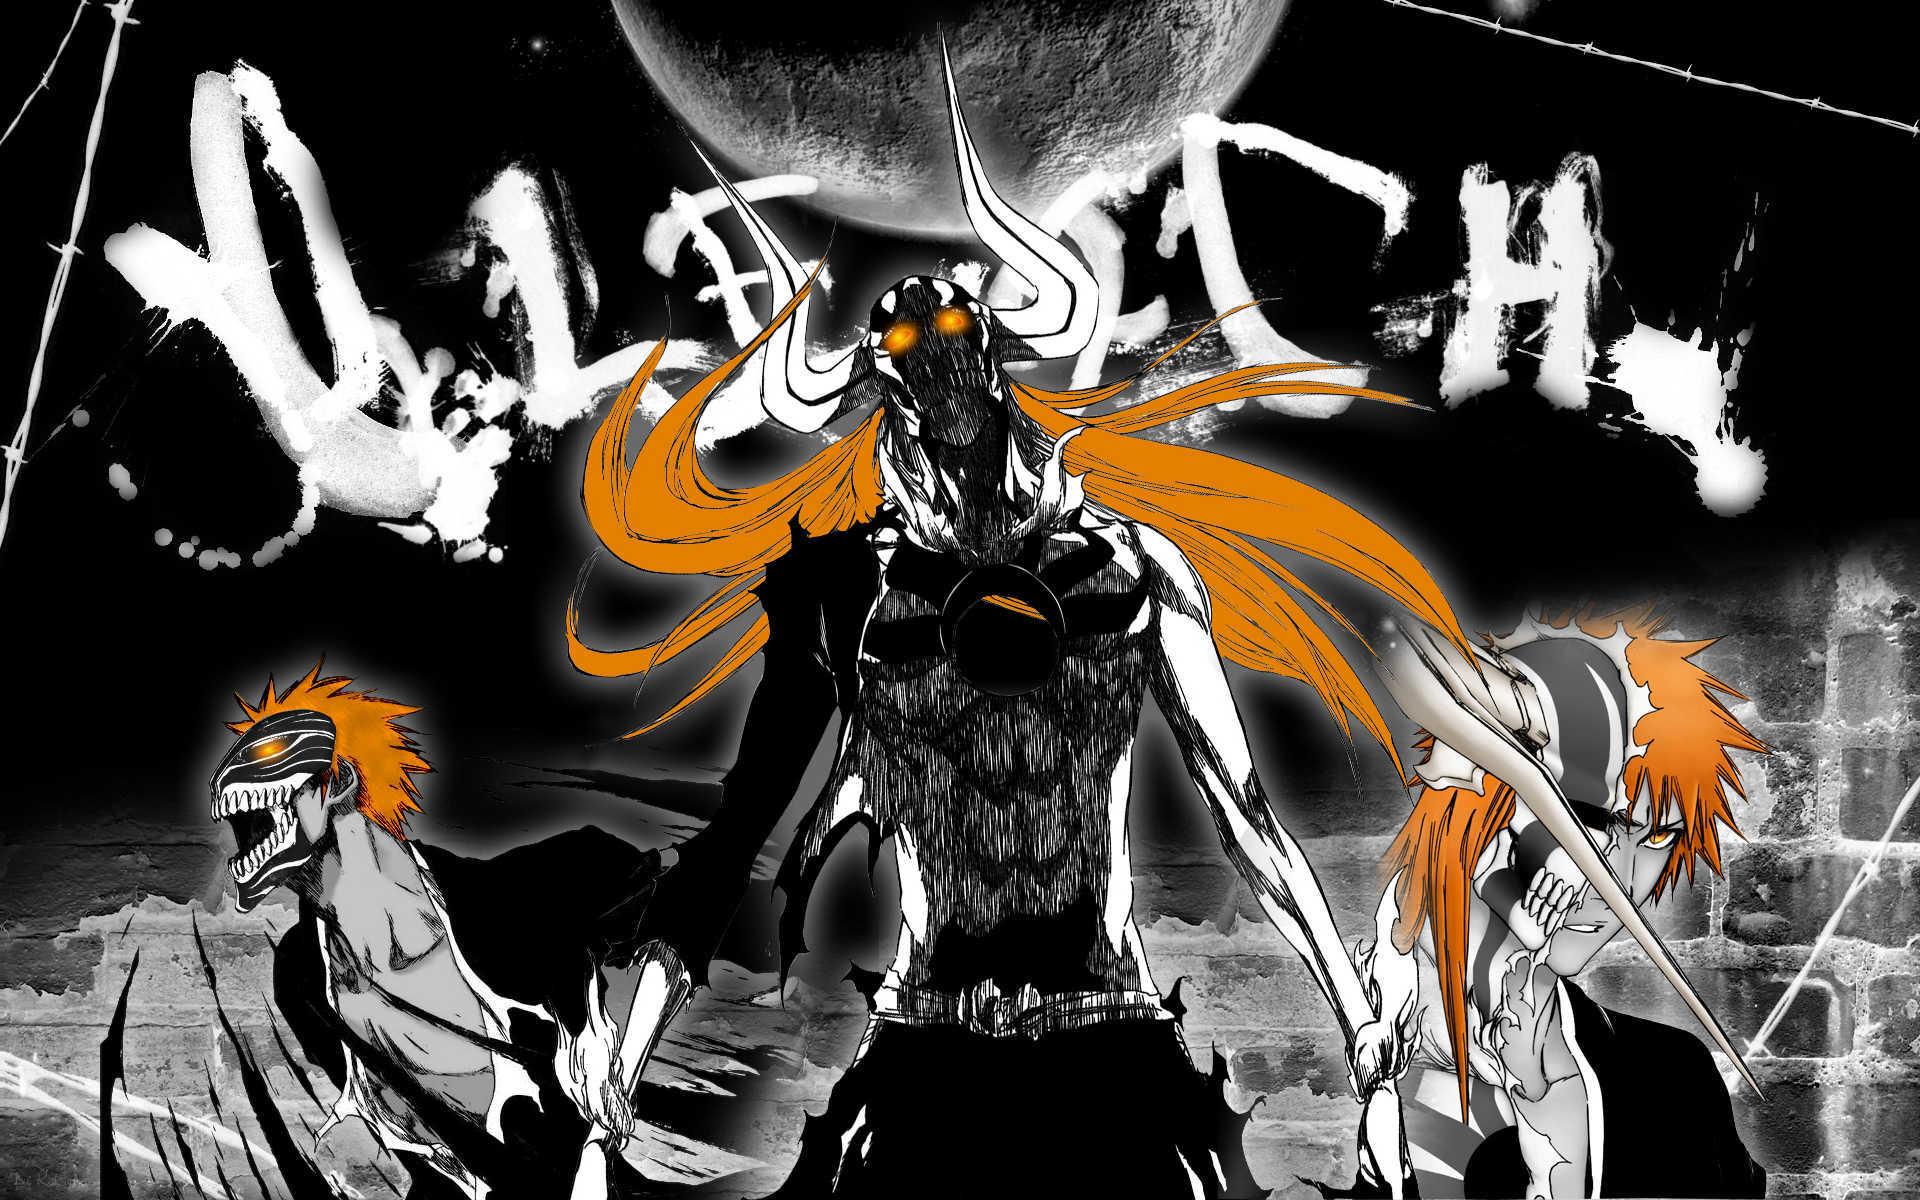 Bleach Anime Image Wallpaper Mac For